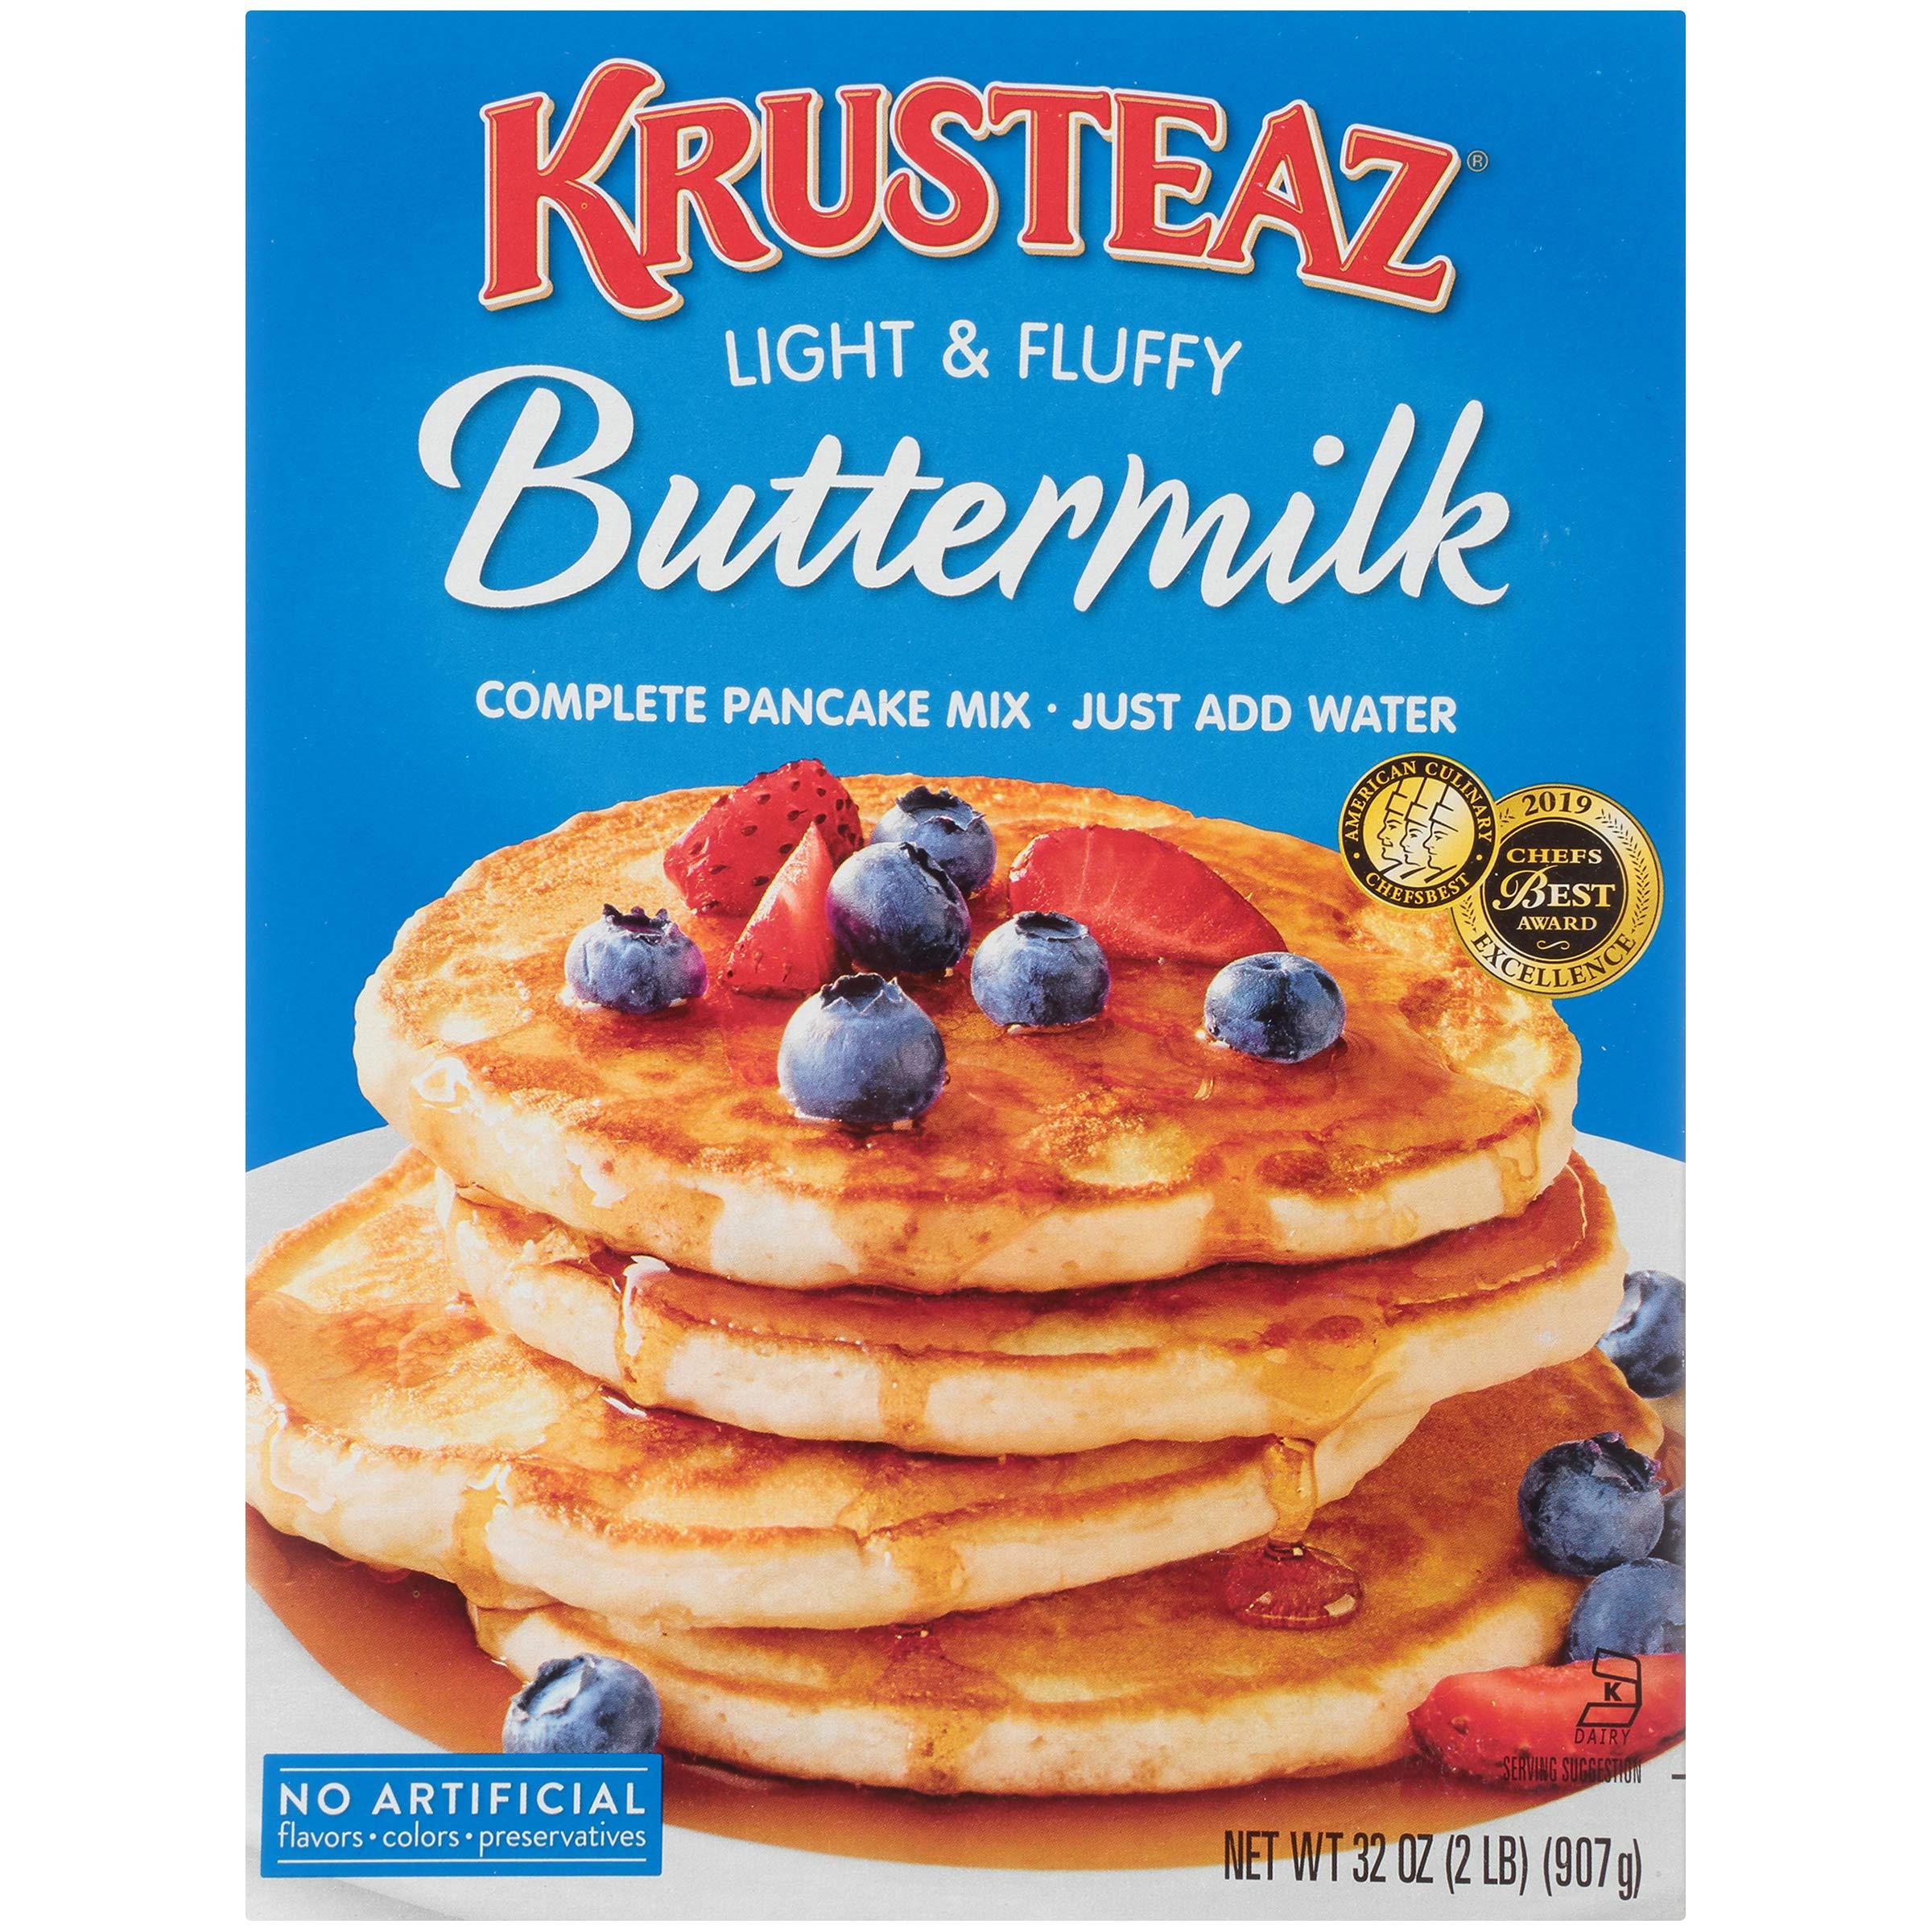 KRUSTEAZ Buttermilk Complete Pancake Mix